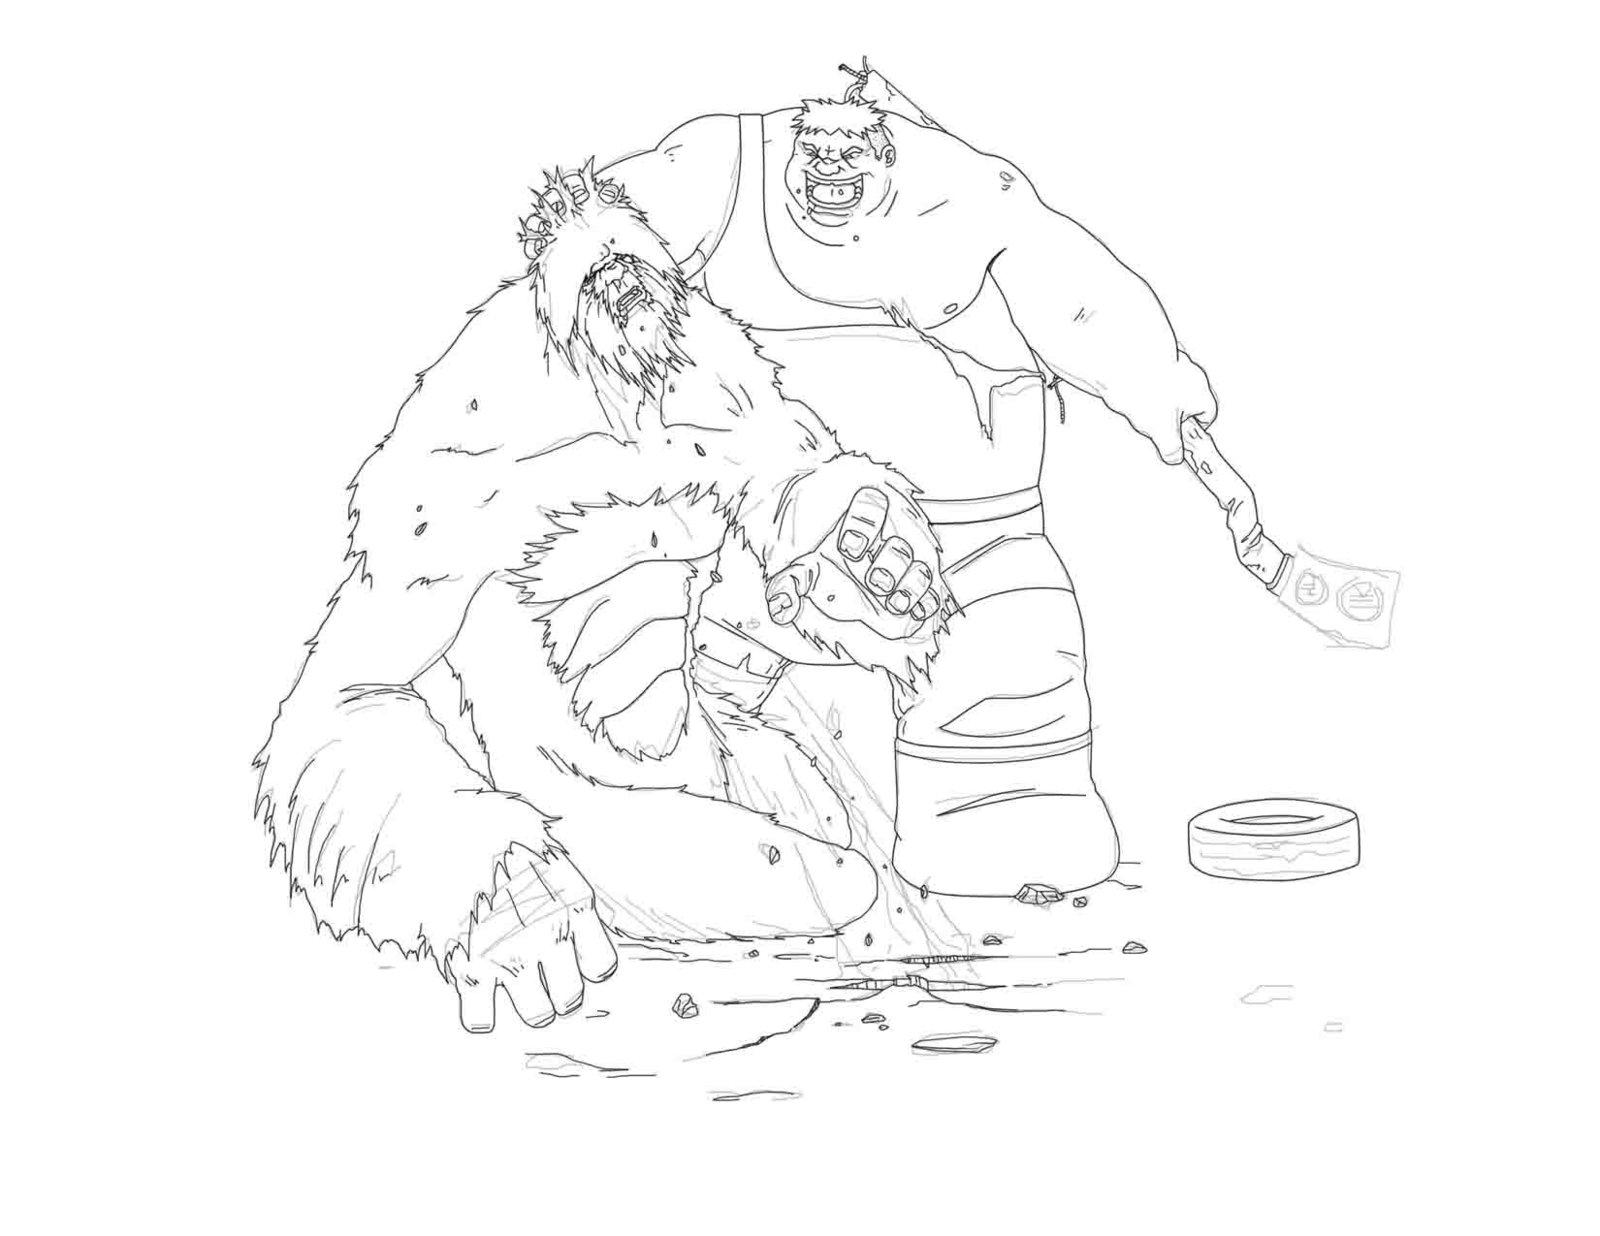 Sasquatch Drawing At Getdrawings